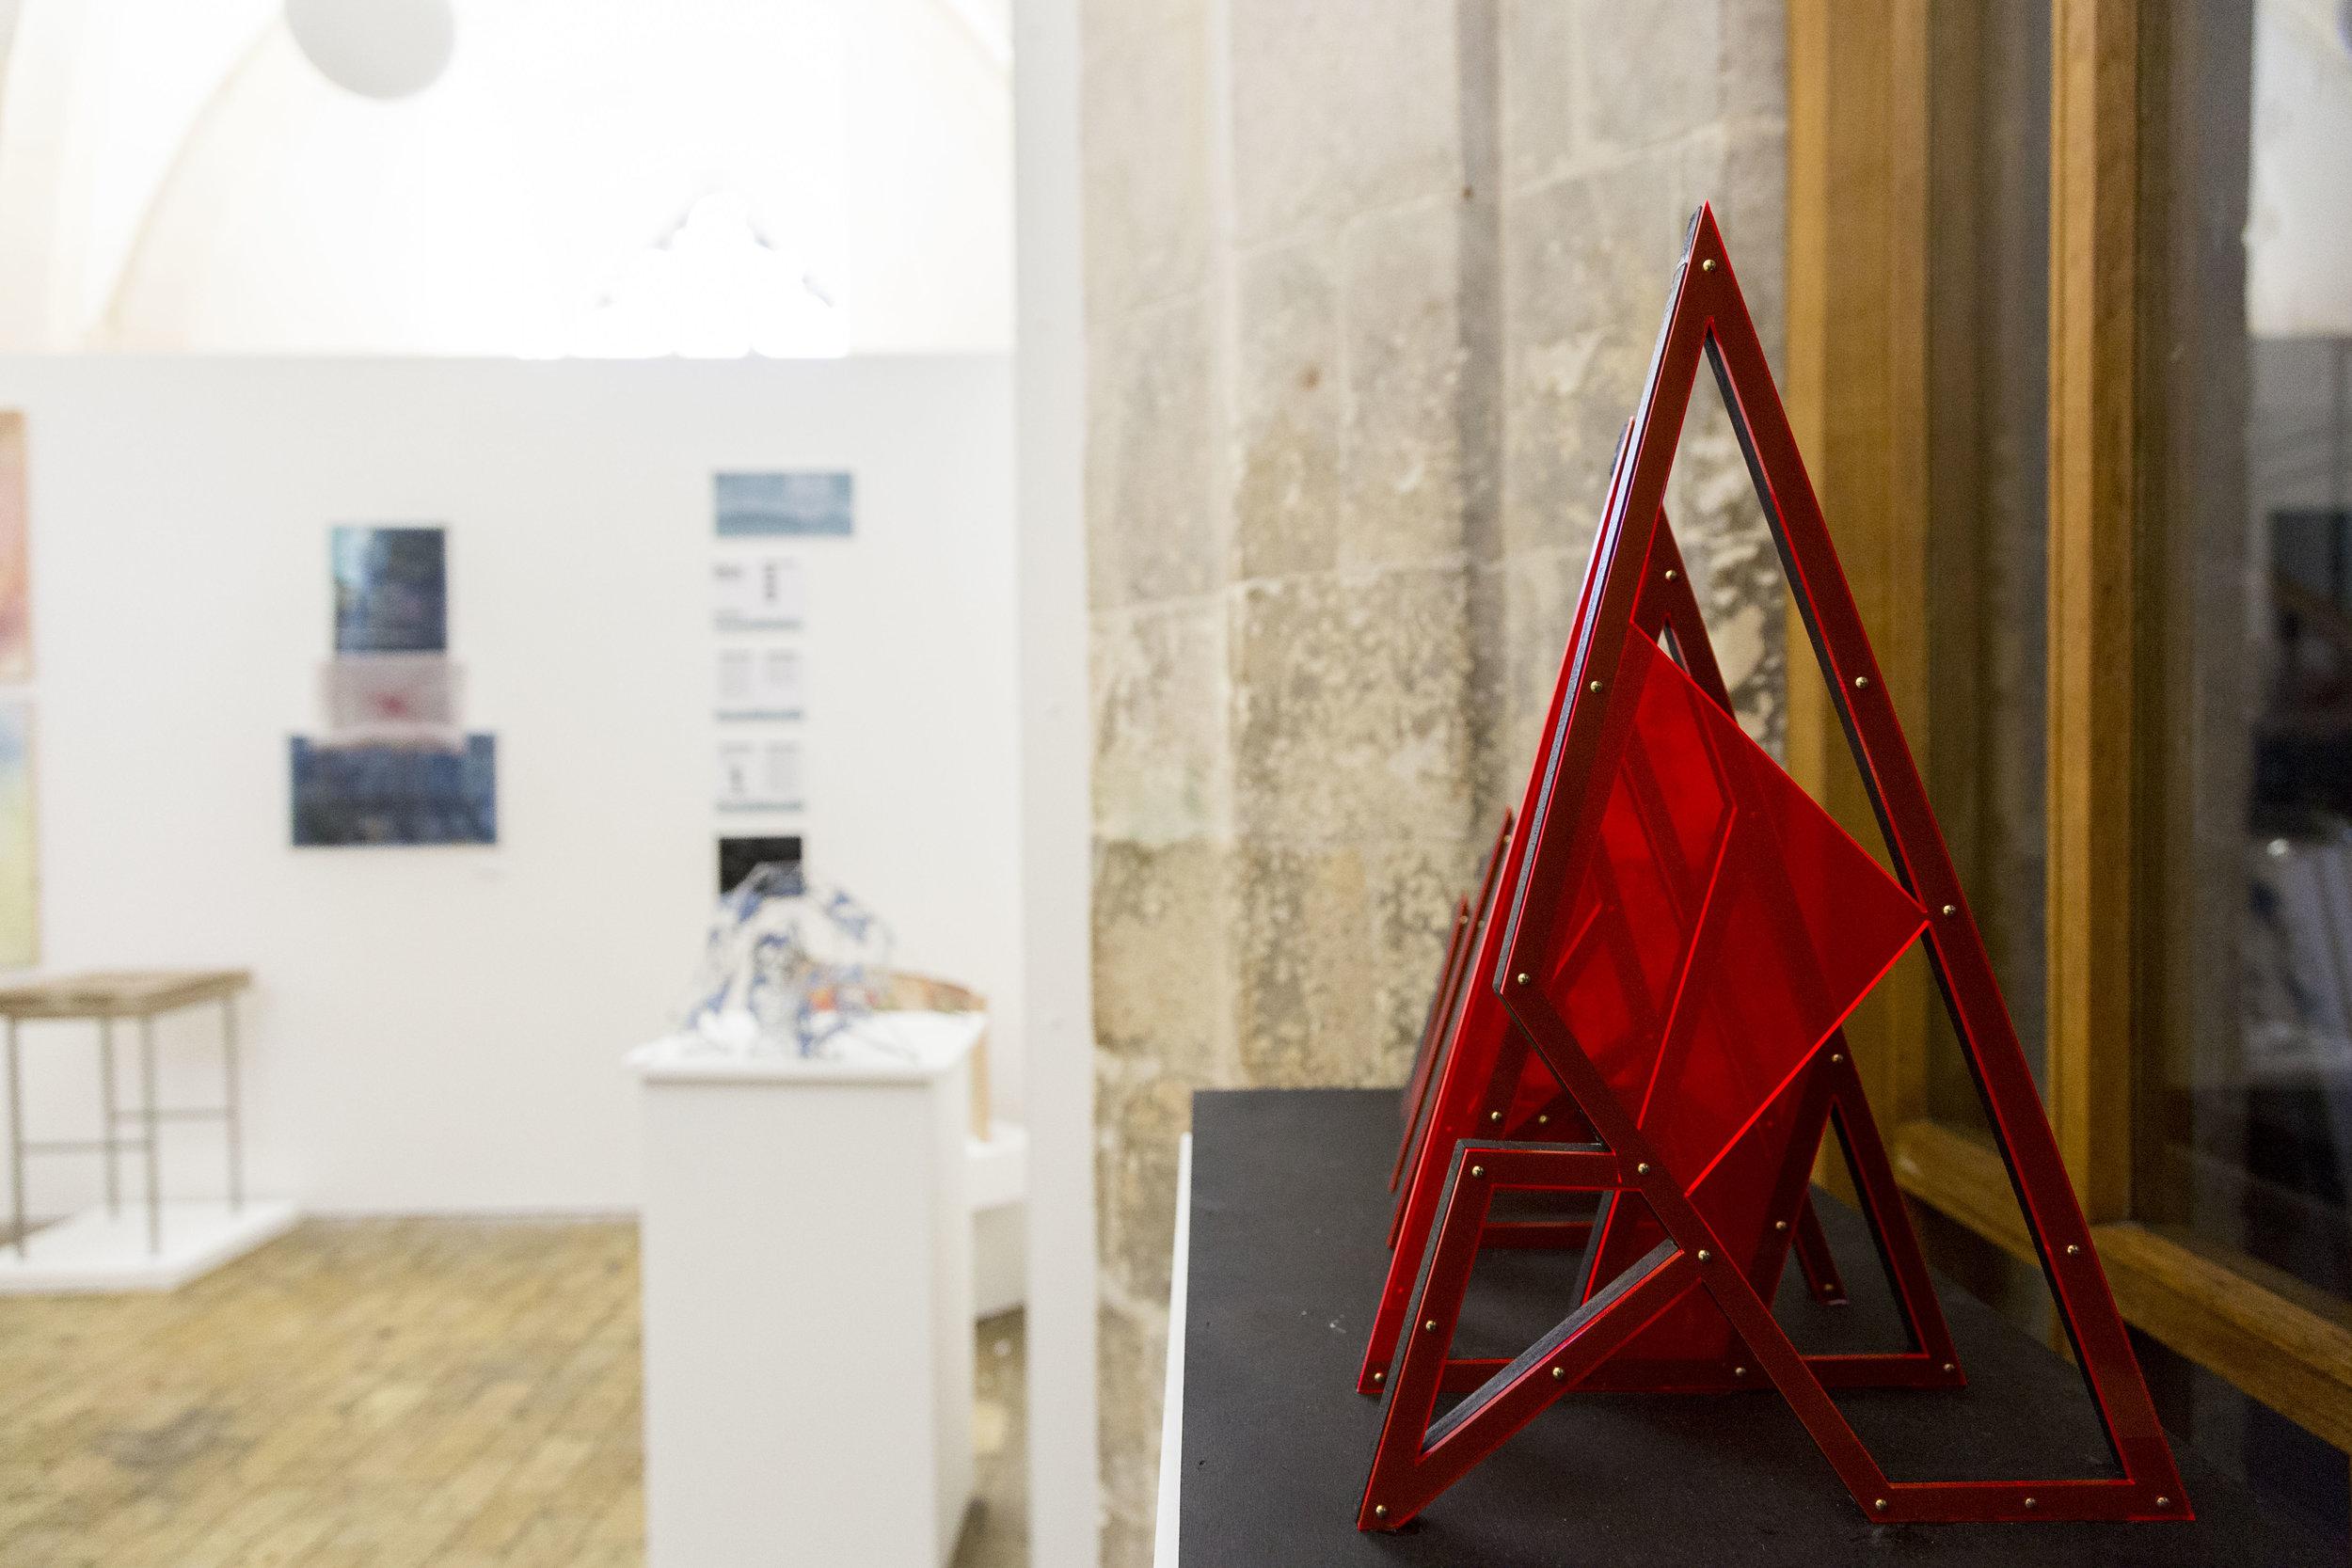 GCSE art exhibition_2018_003.jpg